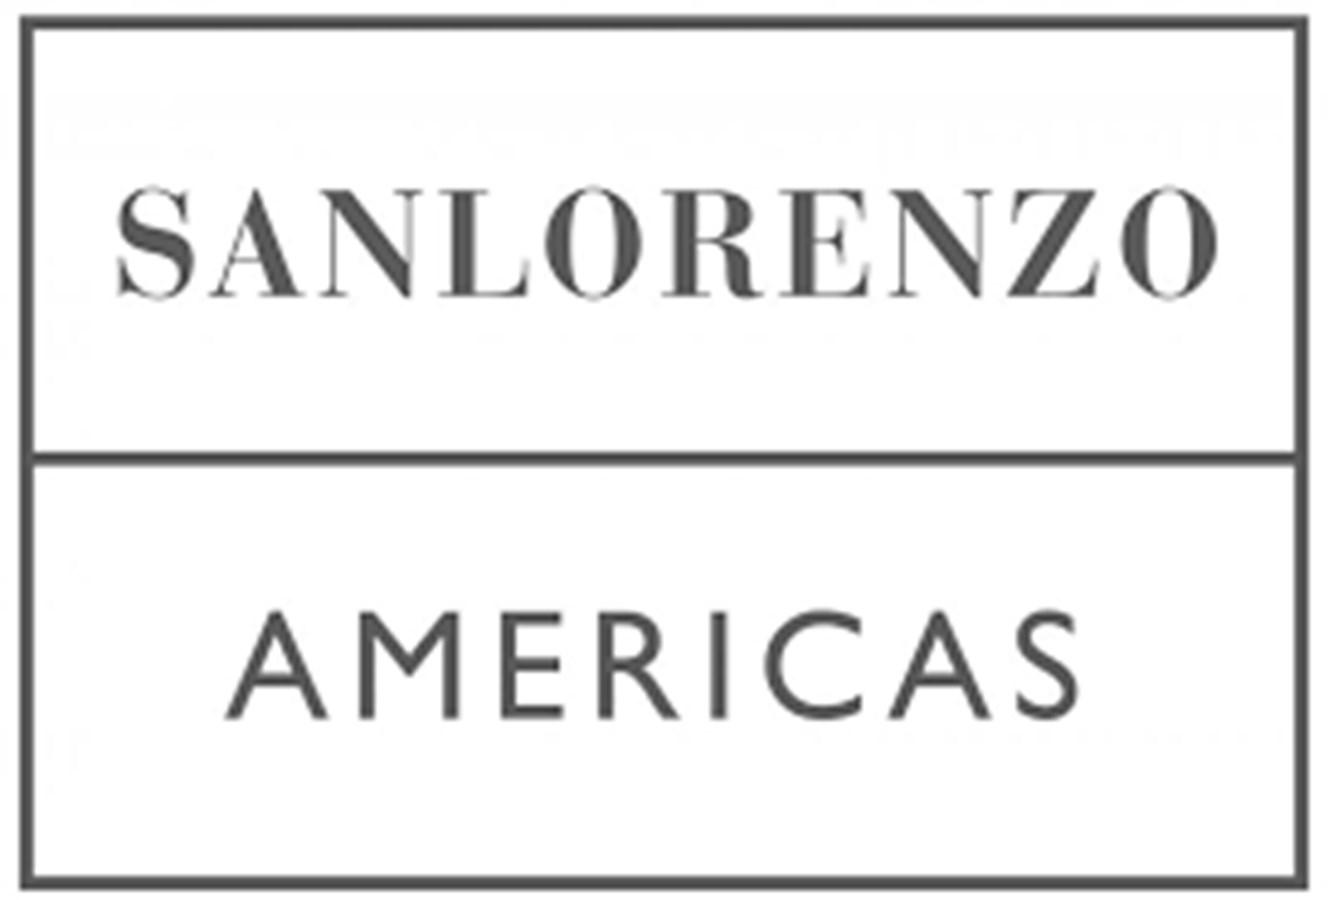 Sanlorenzo  Americas Photo 21792 Side